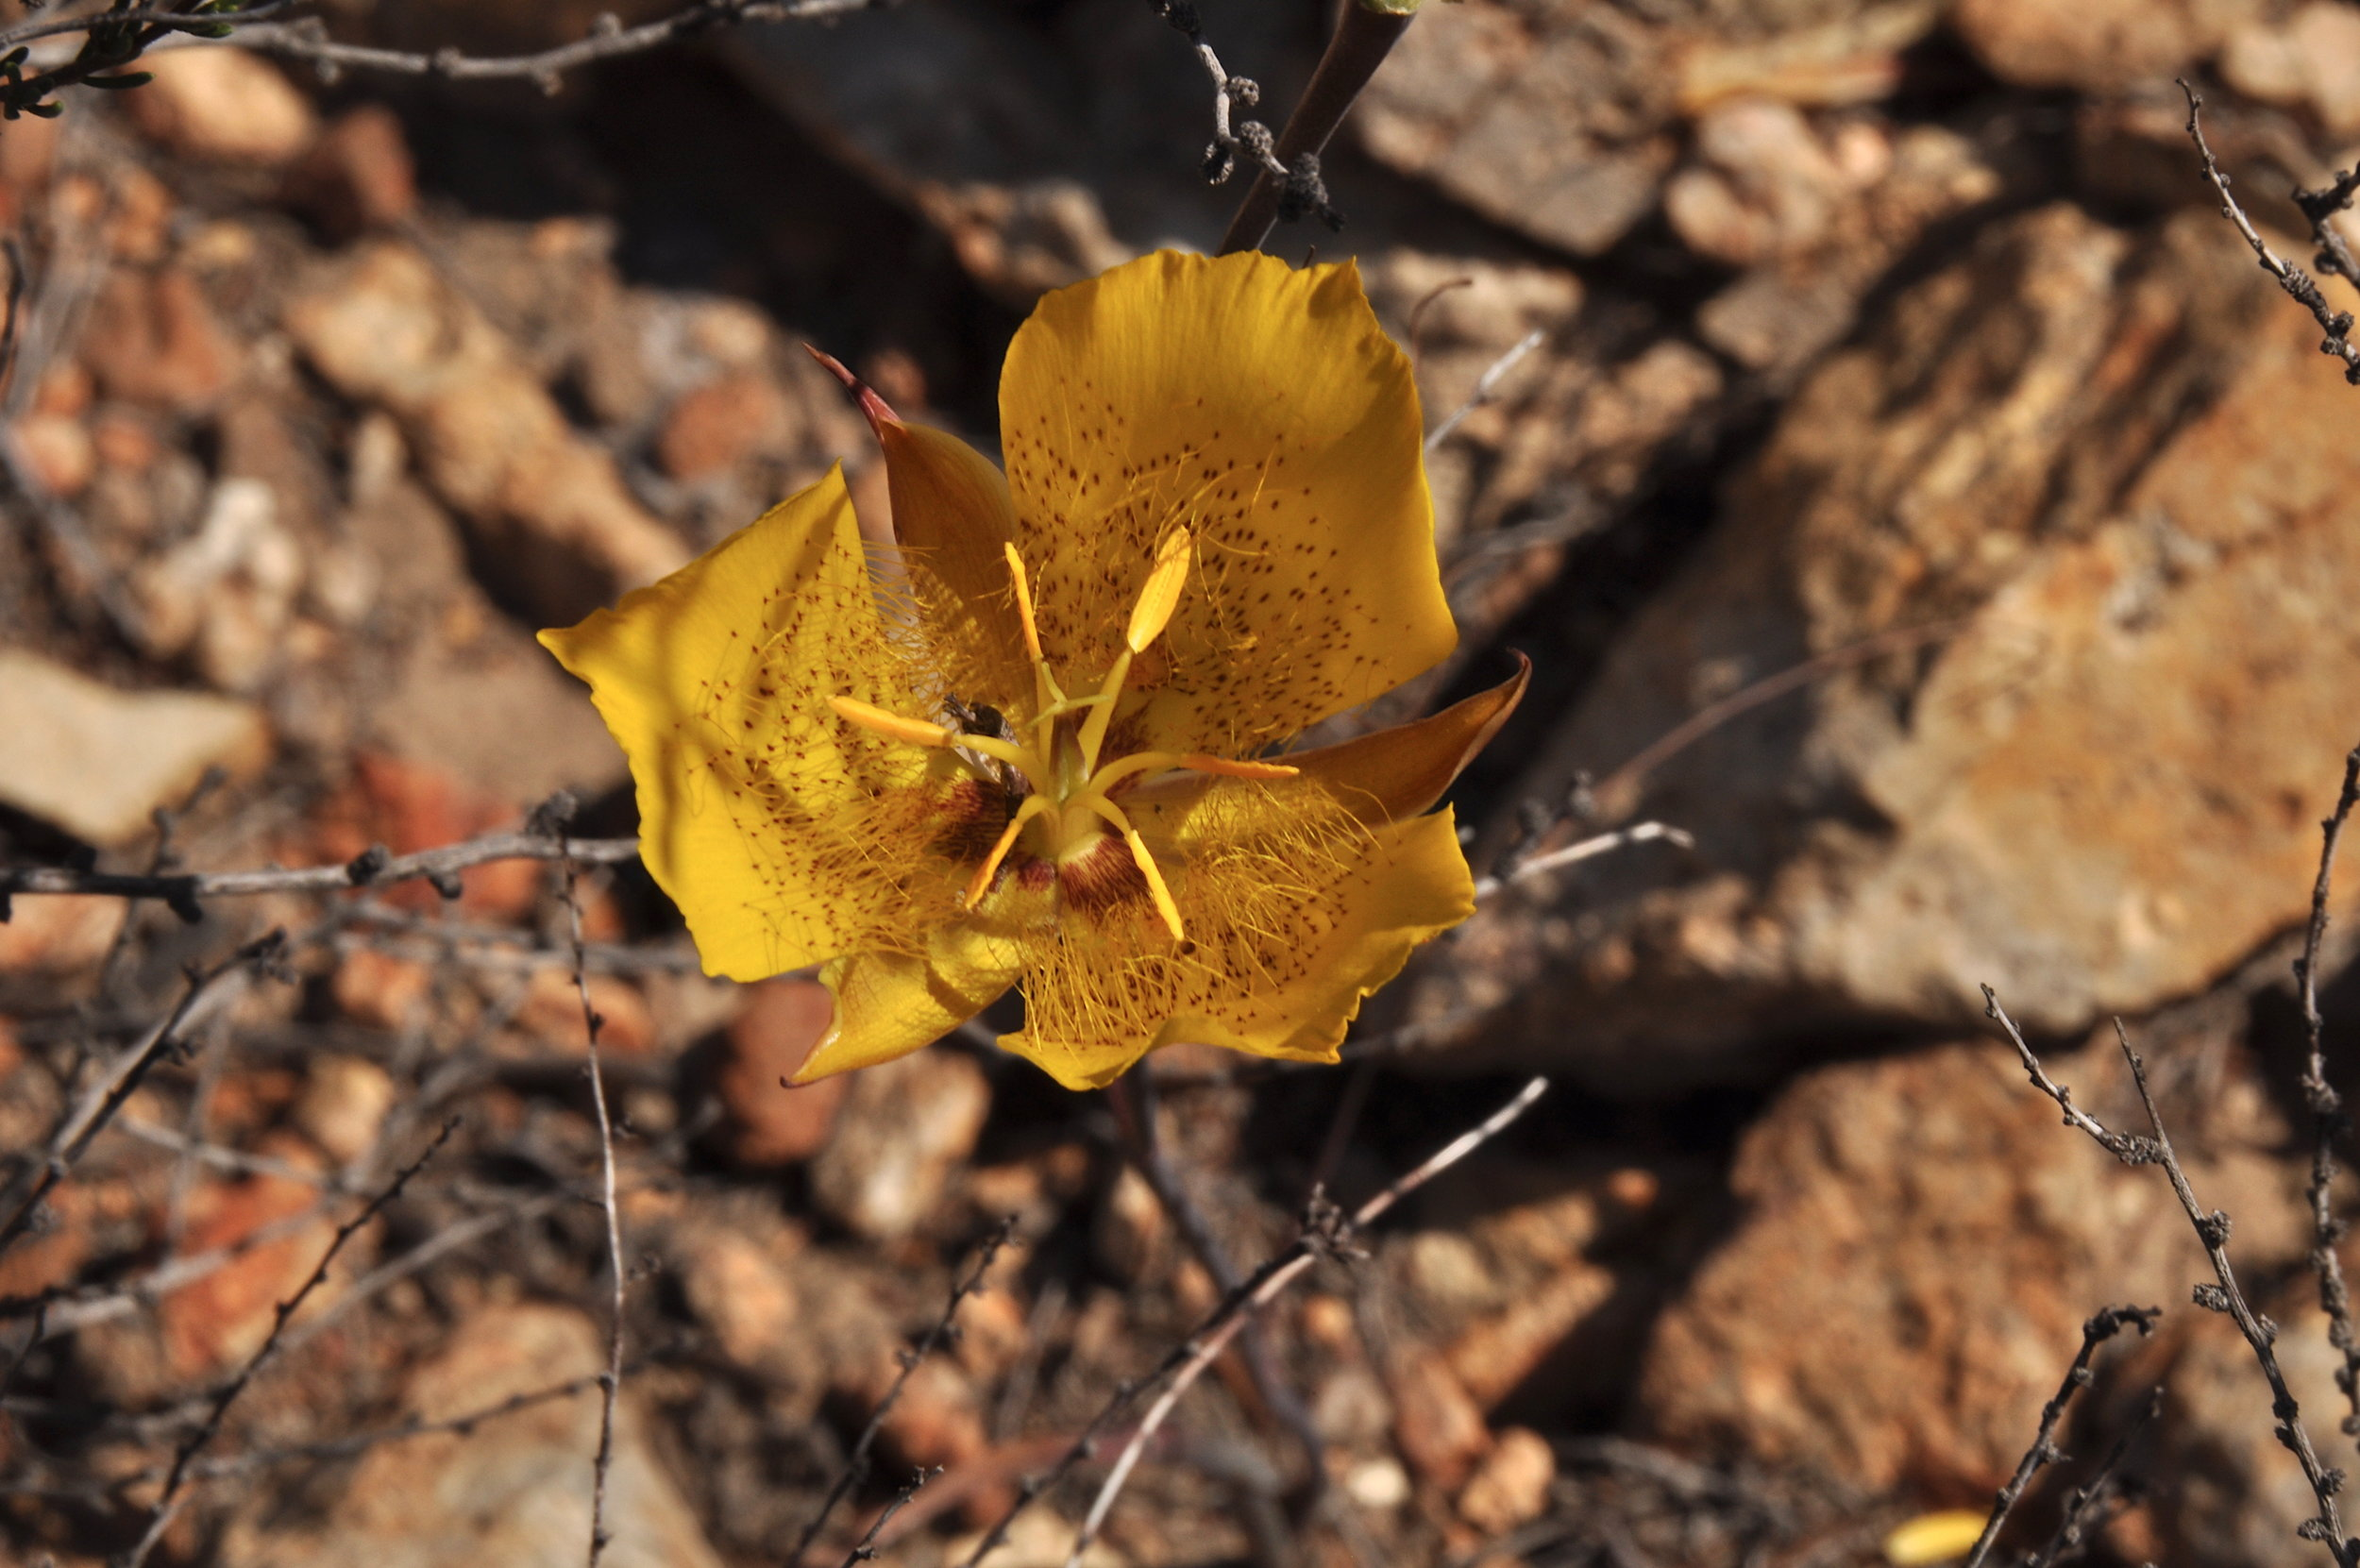 Weed's Mariposa Lily (Calochortus weedii)